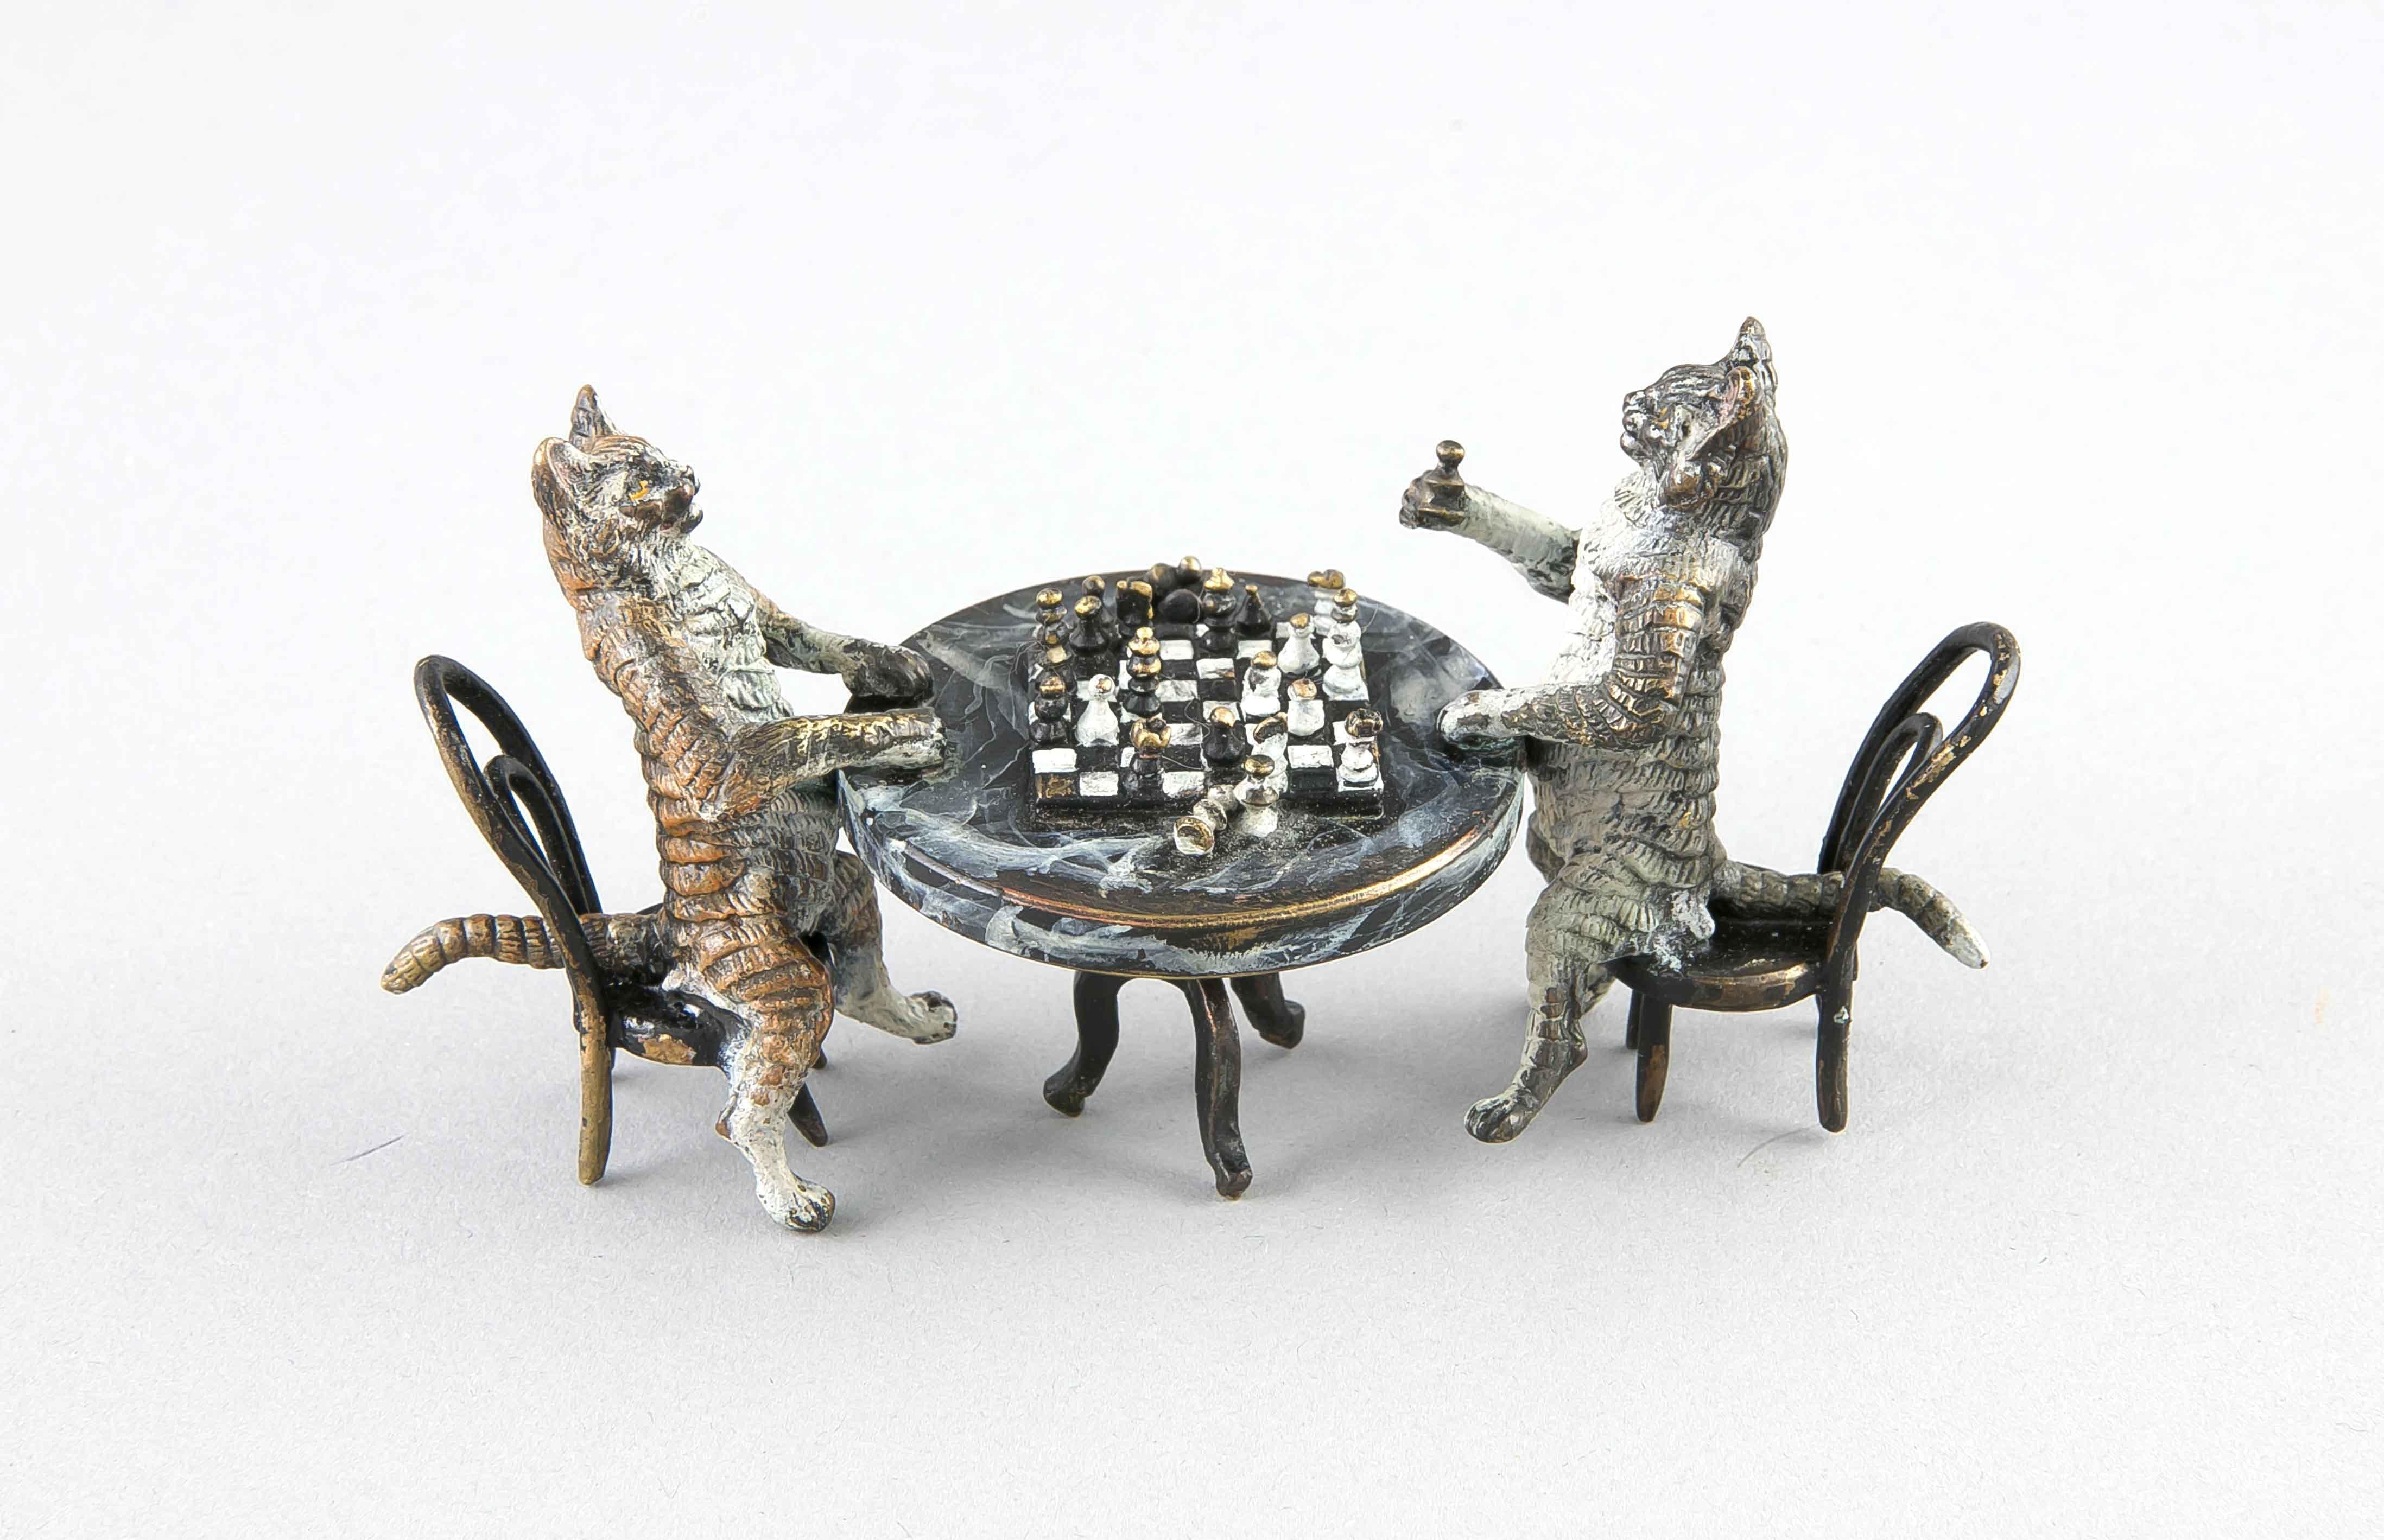 Franz Xaver Bergmann › Oriental › Erotic › Animal Figures